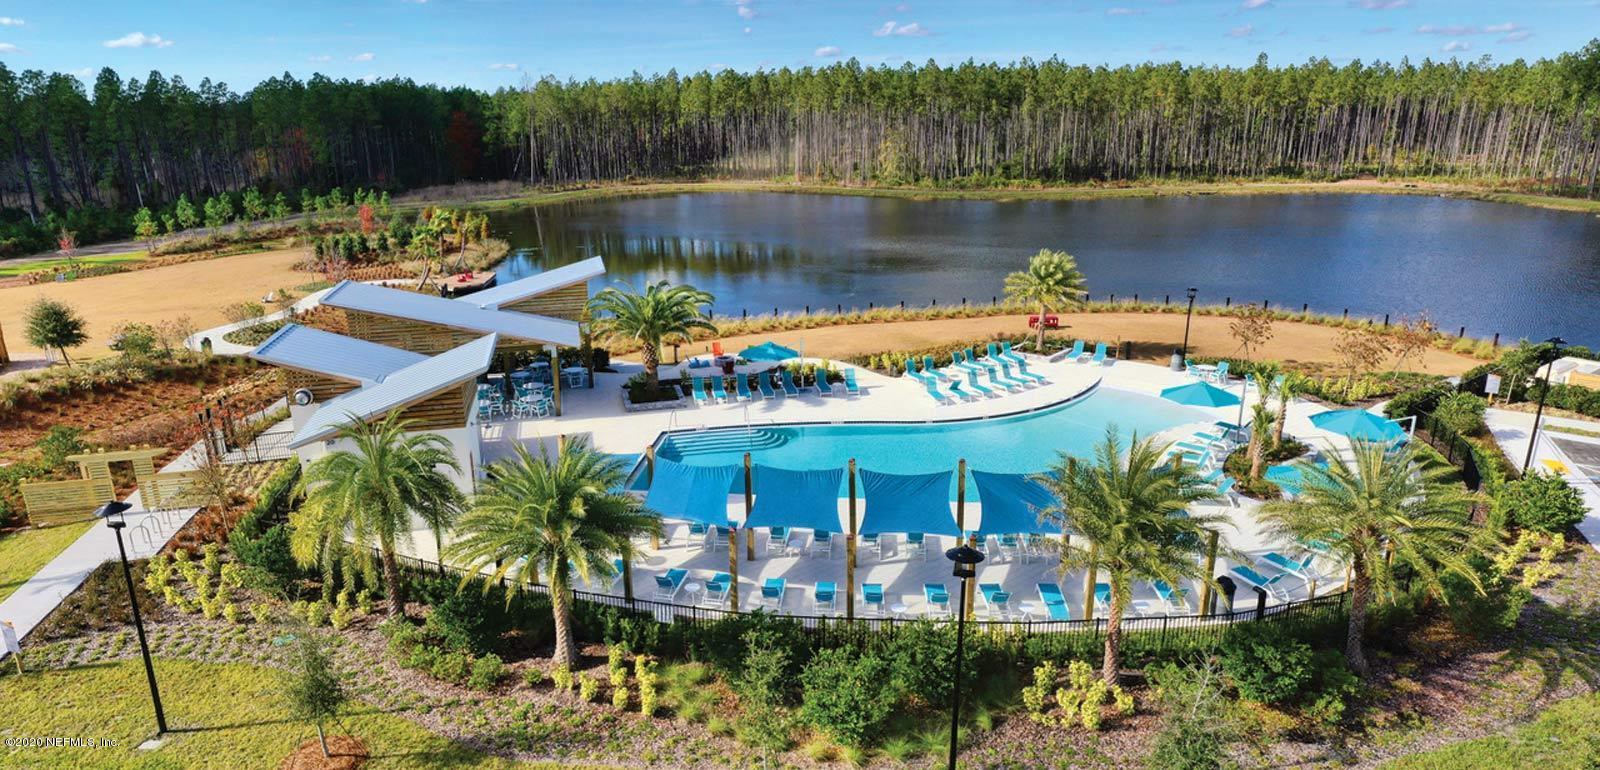 457 FIREBRUSH, YULEE, FLORIDA 32097, 3 Bedrooms Bedrooms, ,2 BathroomsBathrooms,Residential,For sale,FIREBRUSH,1079981